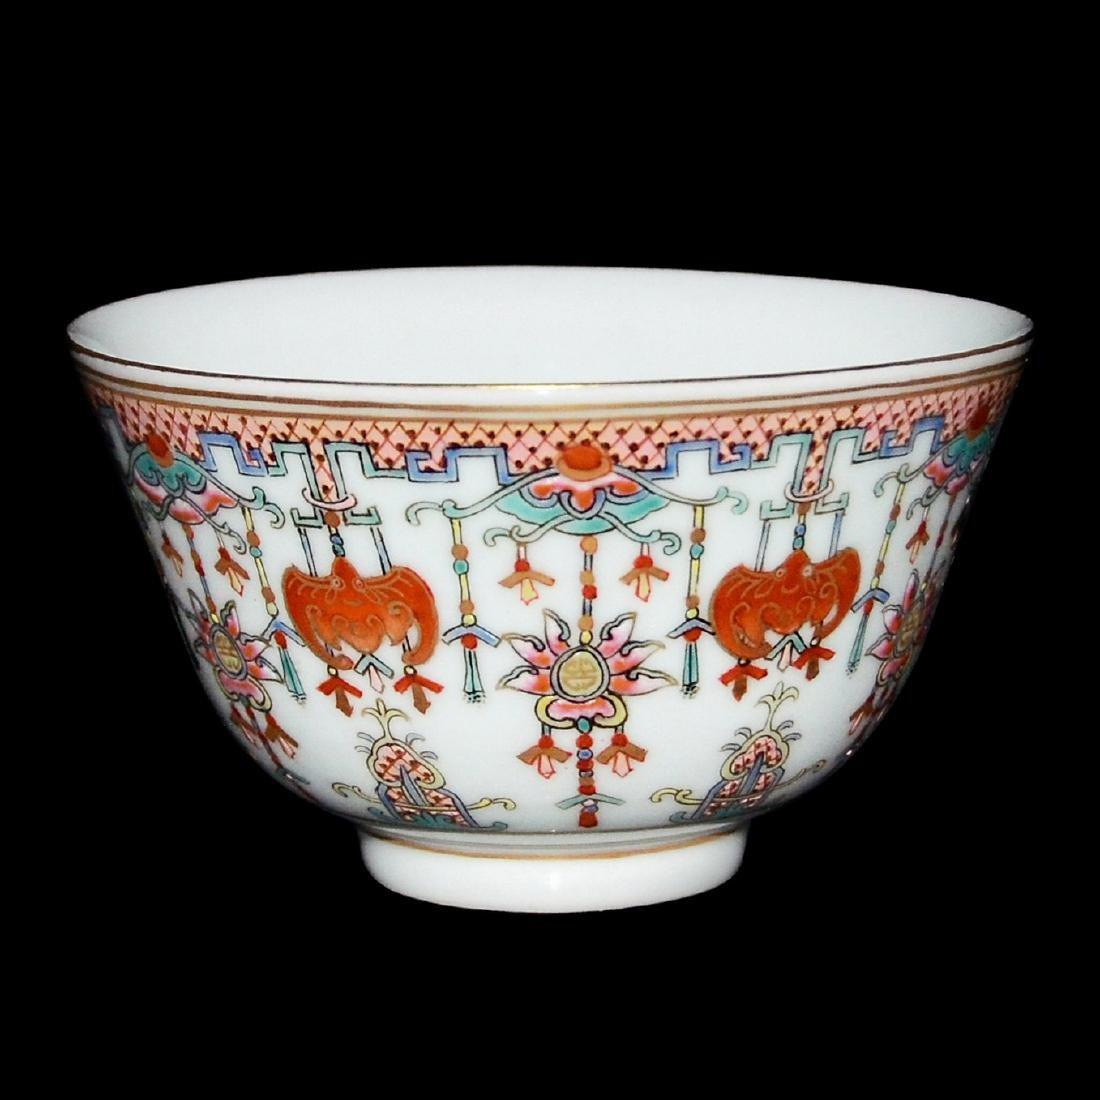 Qing, An Auspicious Emblems Famille-Rose Bowl